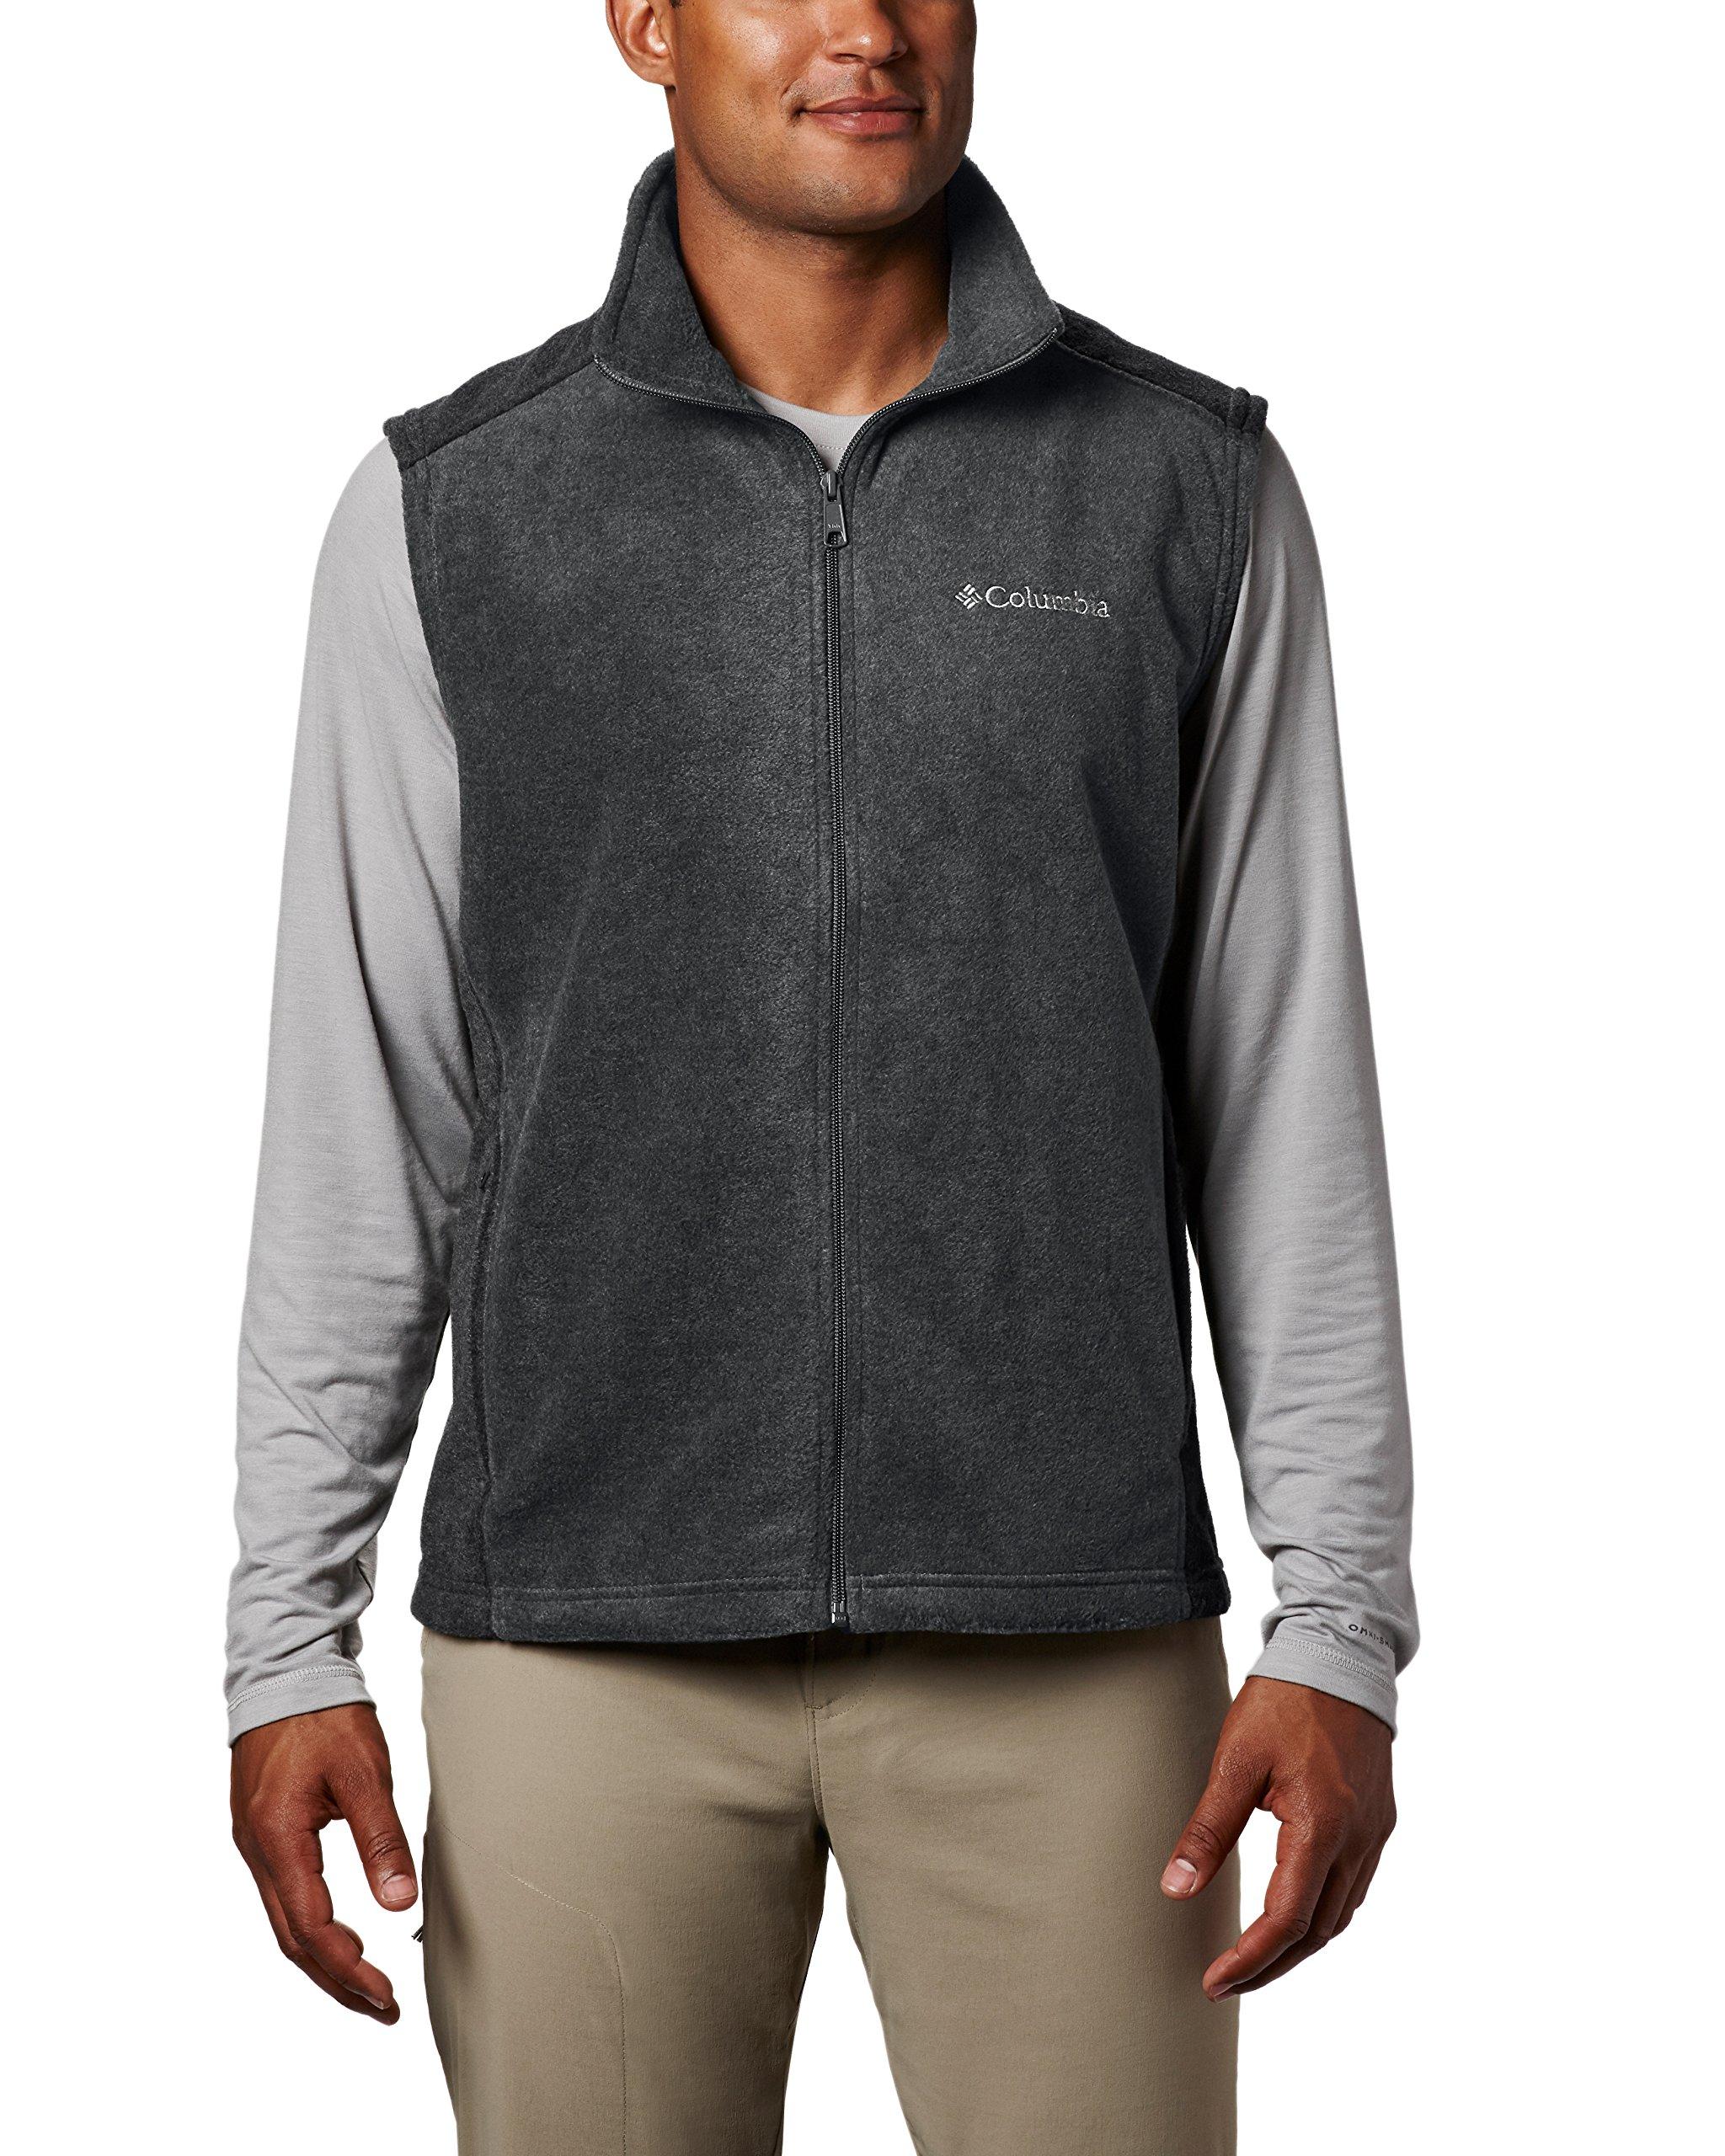 Columbia Men's Steens Mountain Full Zip Soft Fleece Vest, Grill/Black, Large by Columbia